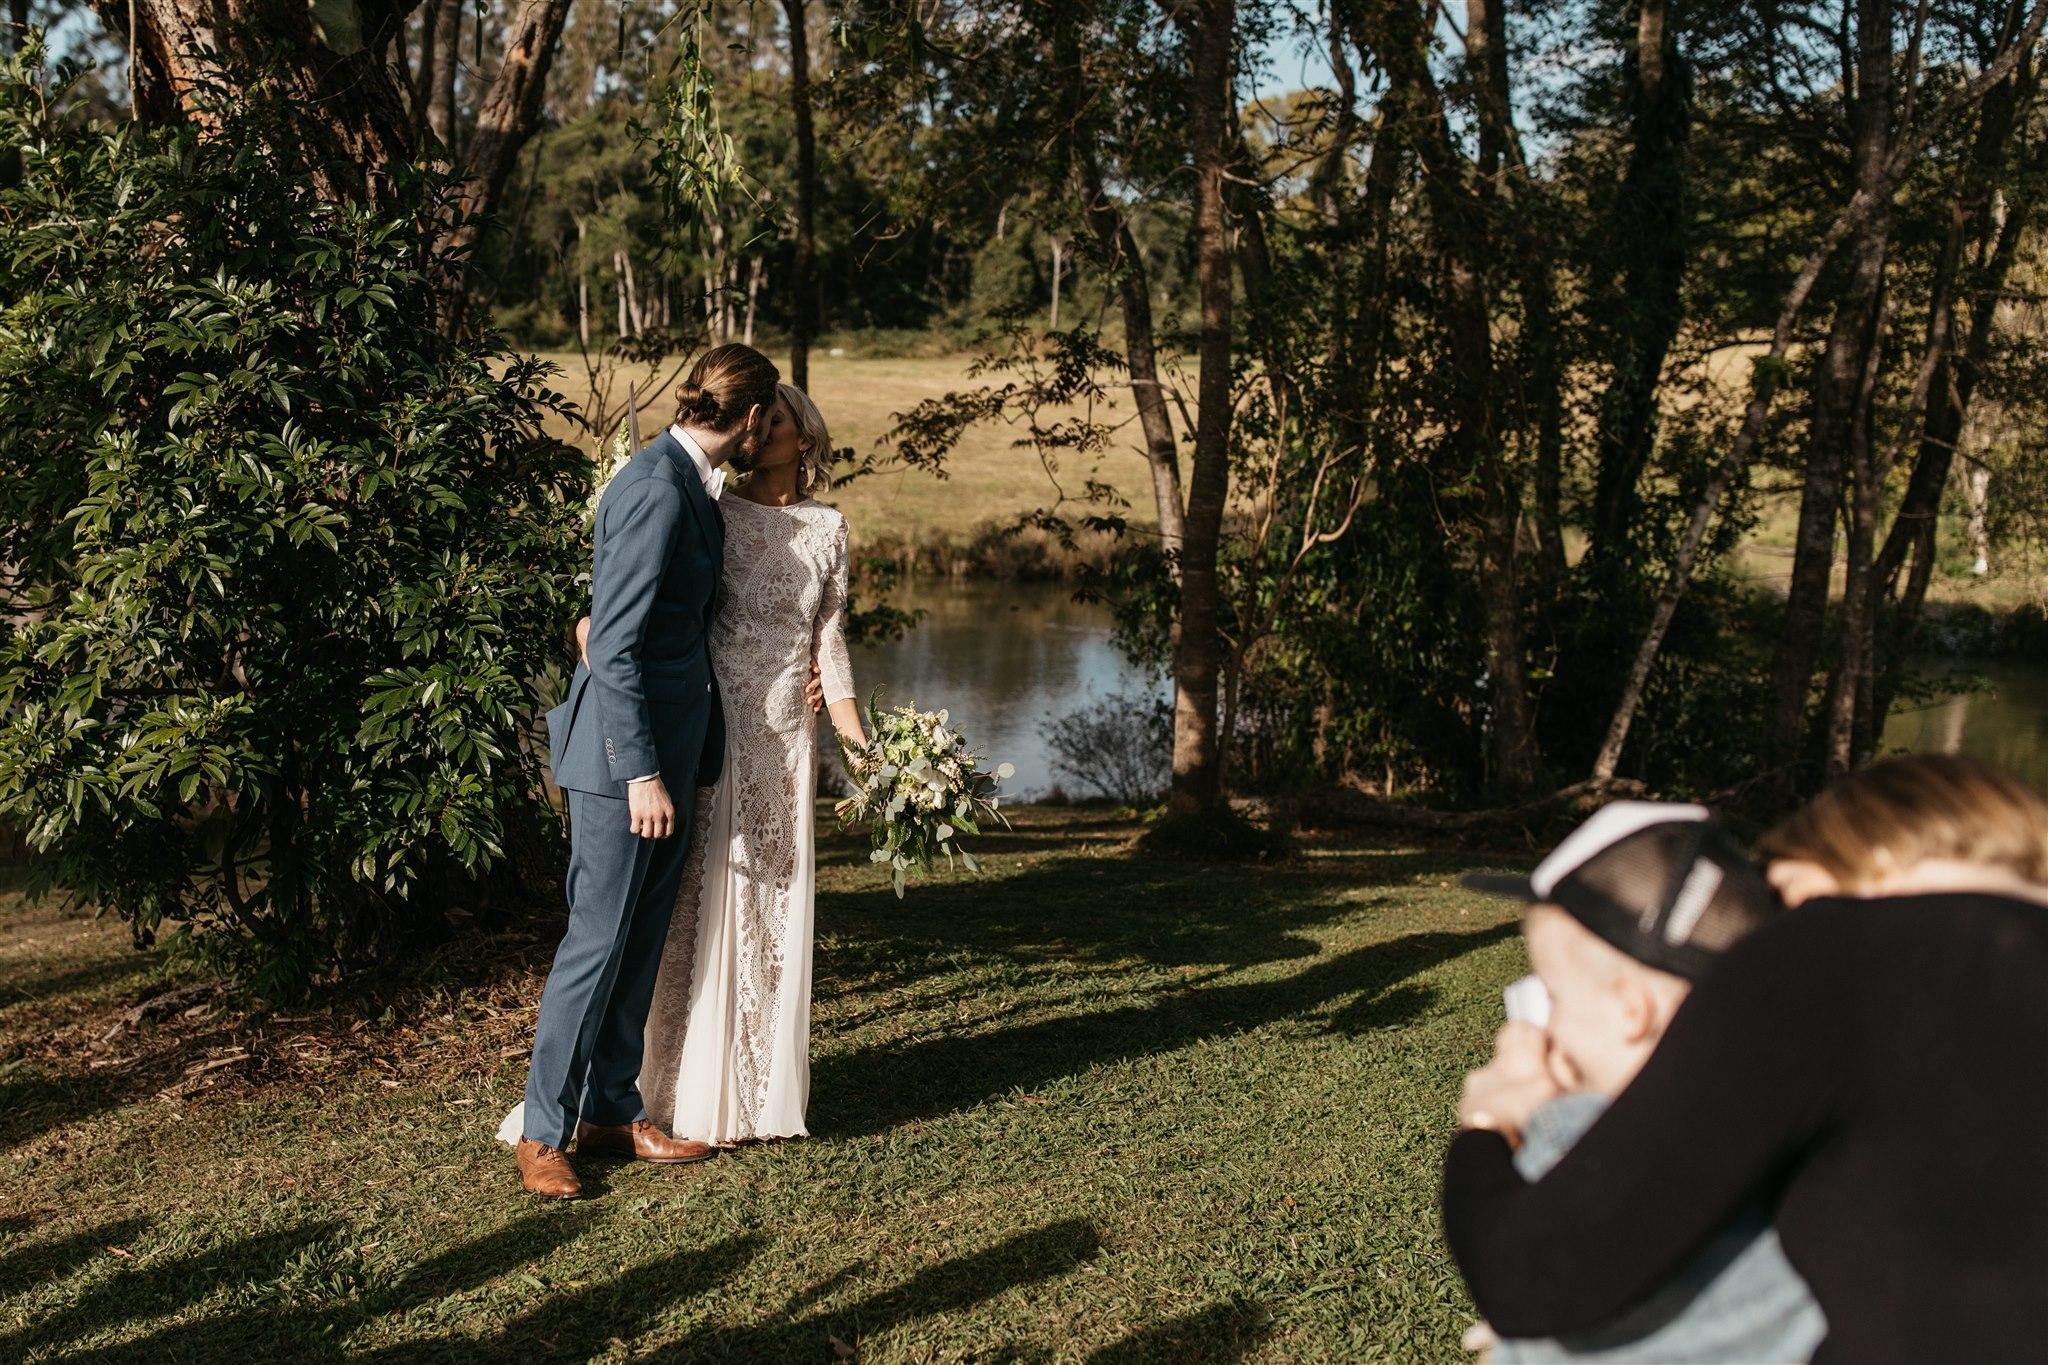 049_SBA-Jen-Tom-Wedding-167.jpg